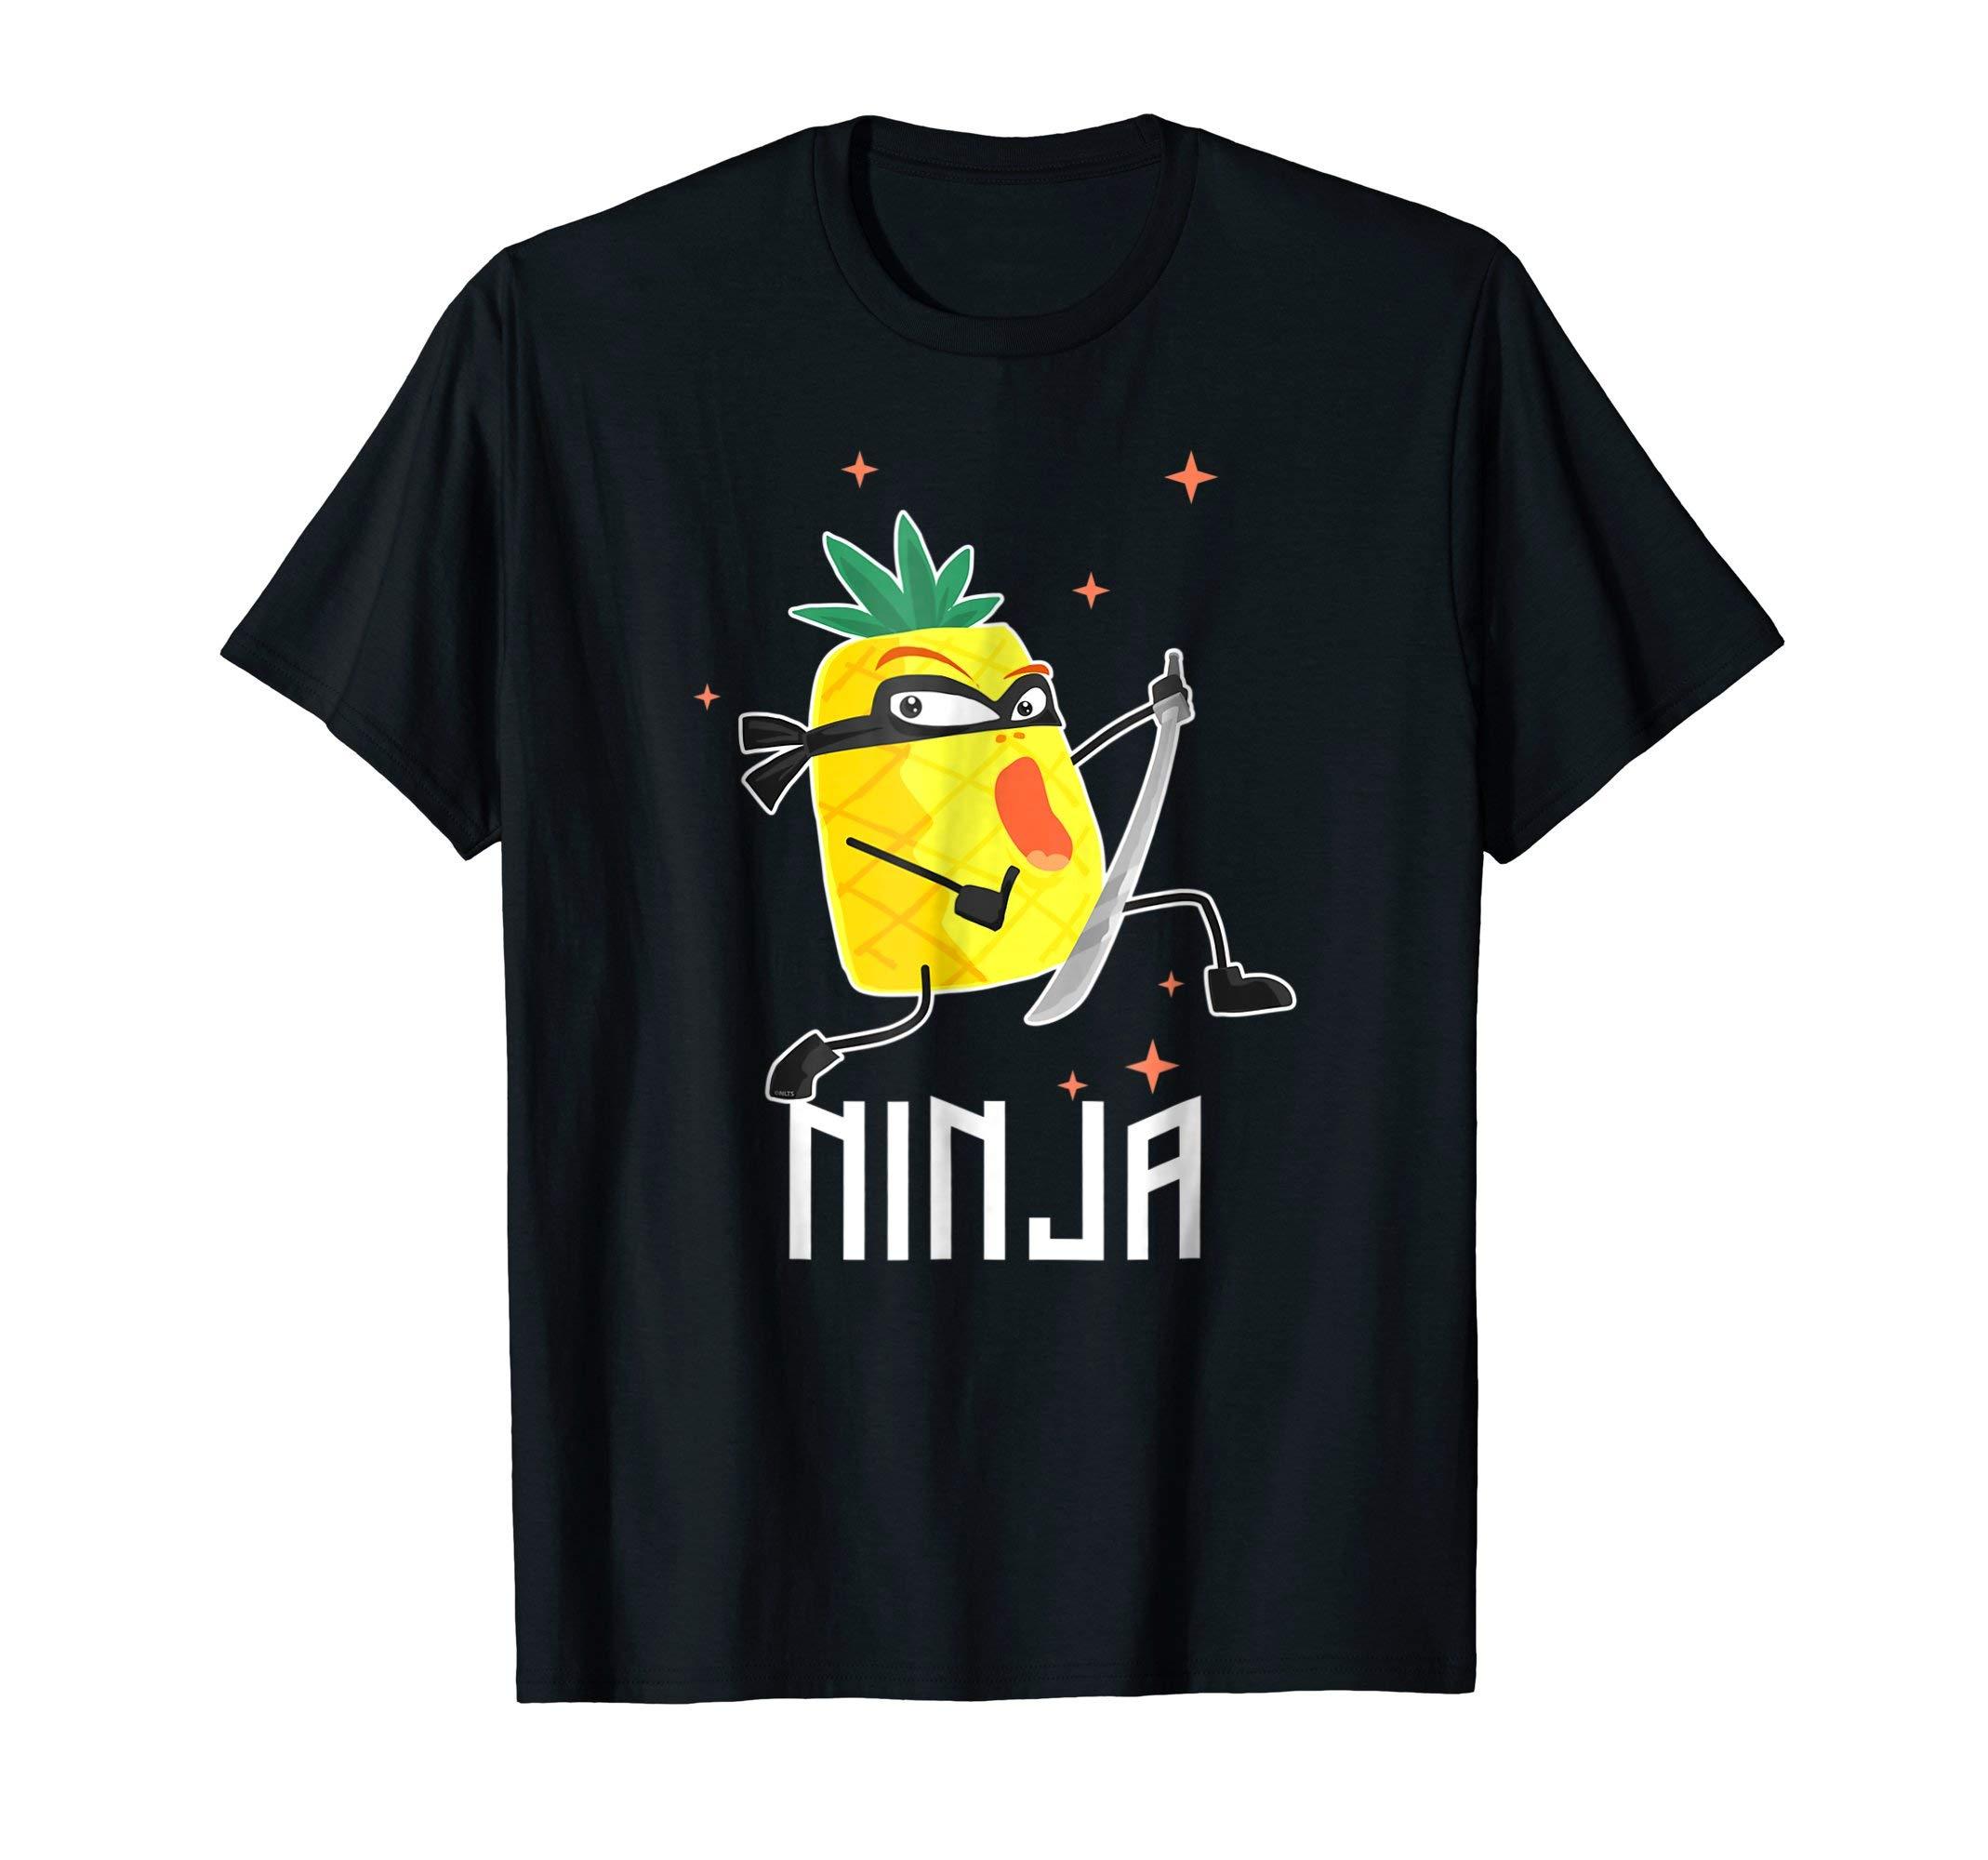 Pineapple-Ninja-Warrior-T-Shirt-Tee-Shirt-Gifts